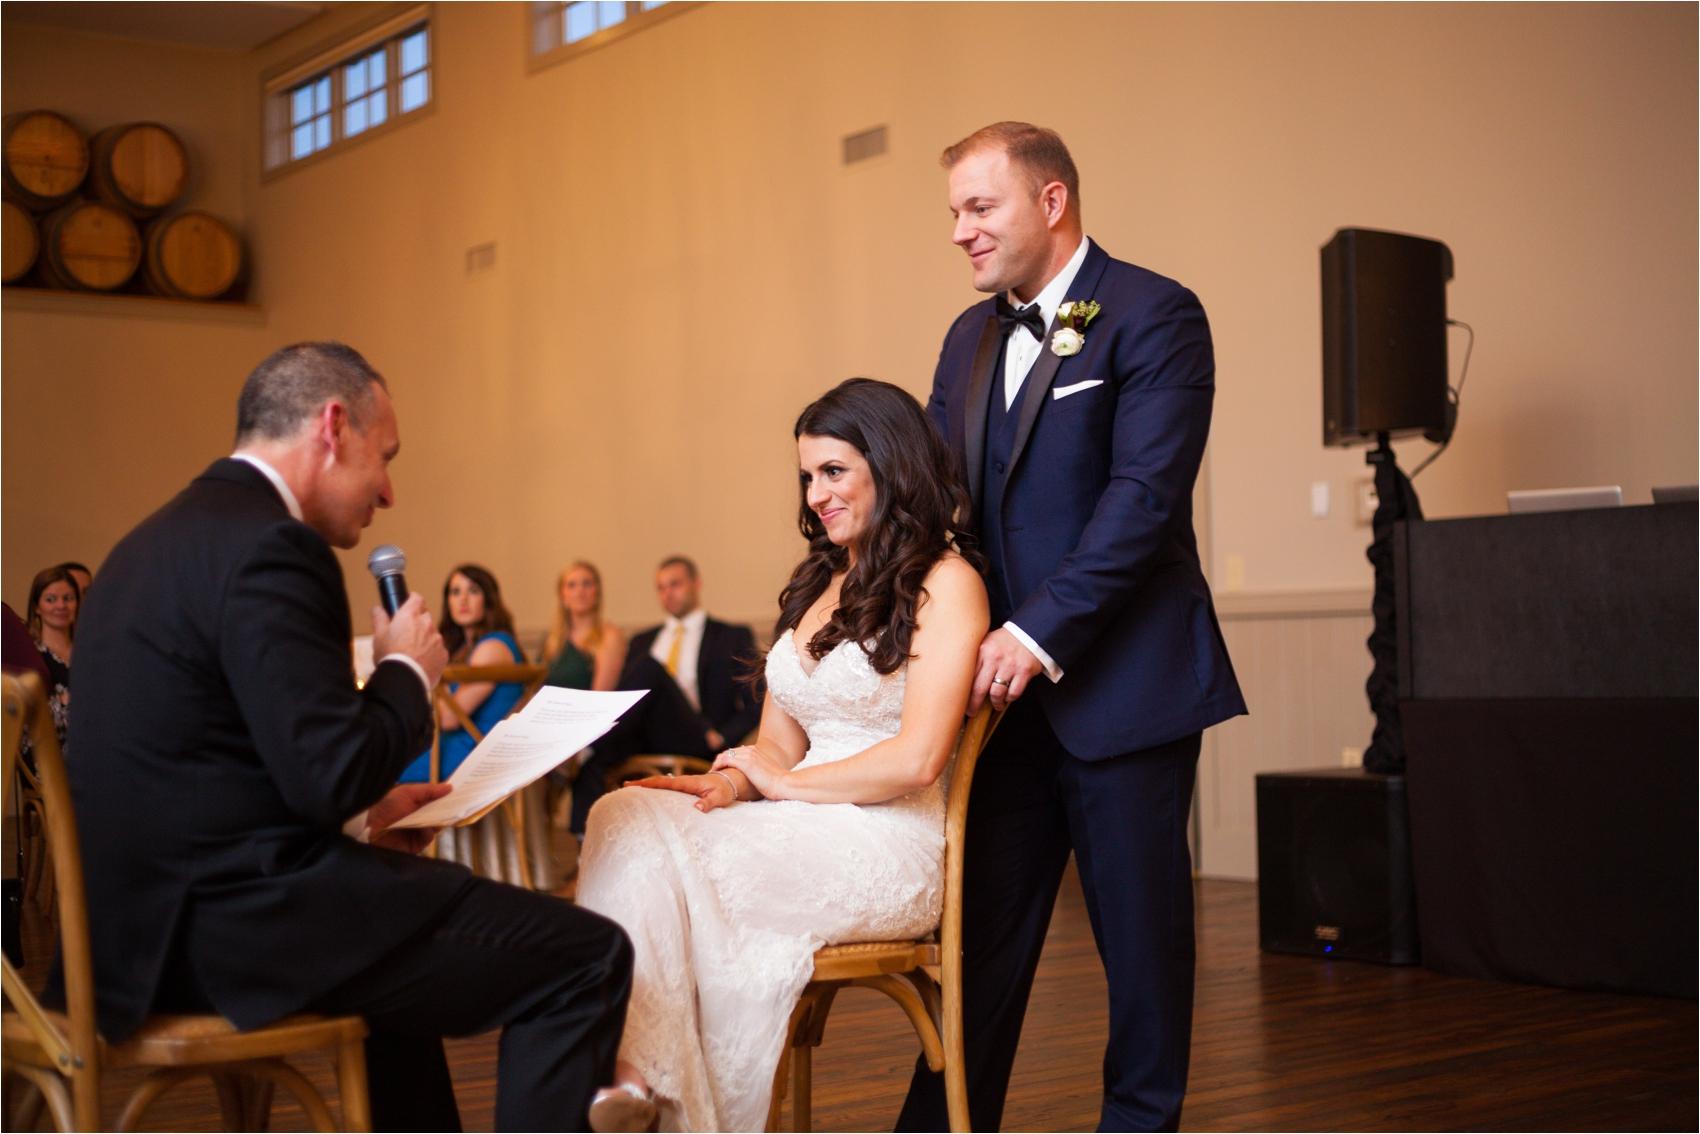 King-Family-Vineyard-Spring-Virginia-Wedding-2028.jpg